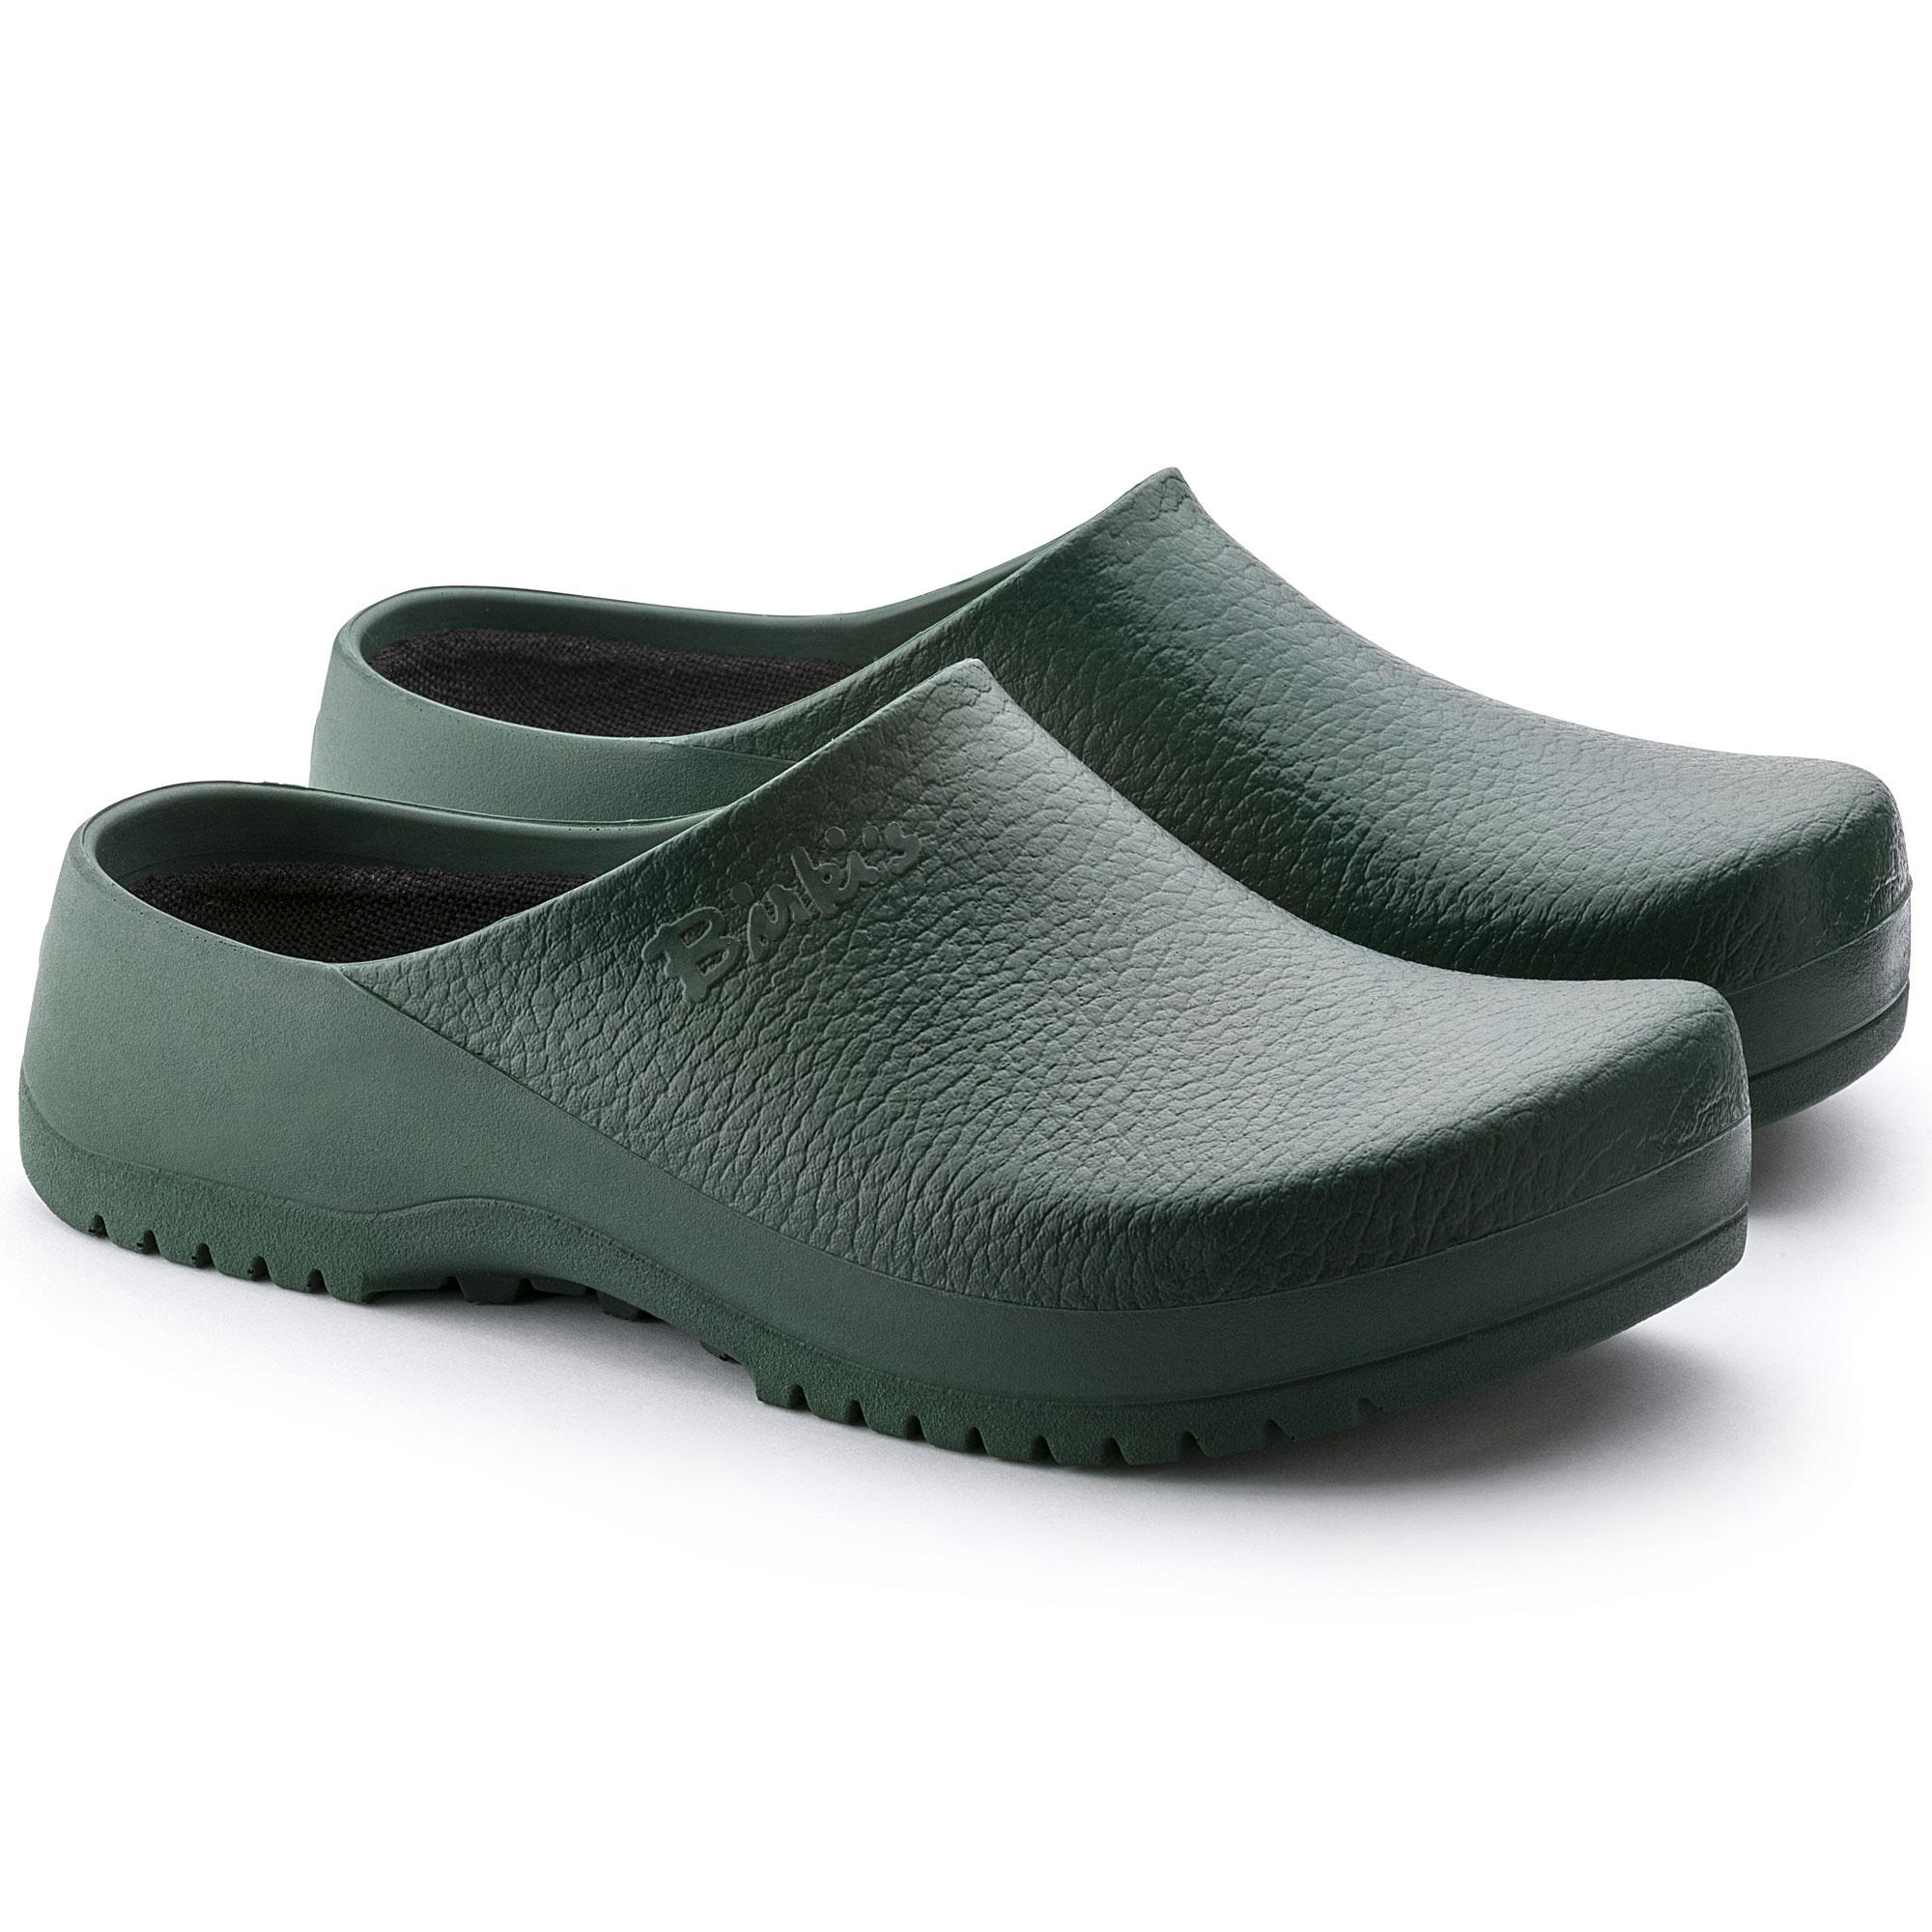 adefca67c616 Polyurethane Green · Polyurethane Green · Polyurethane Green ...